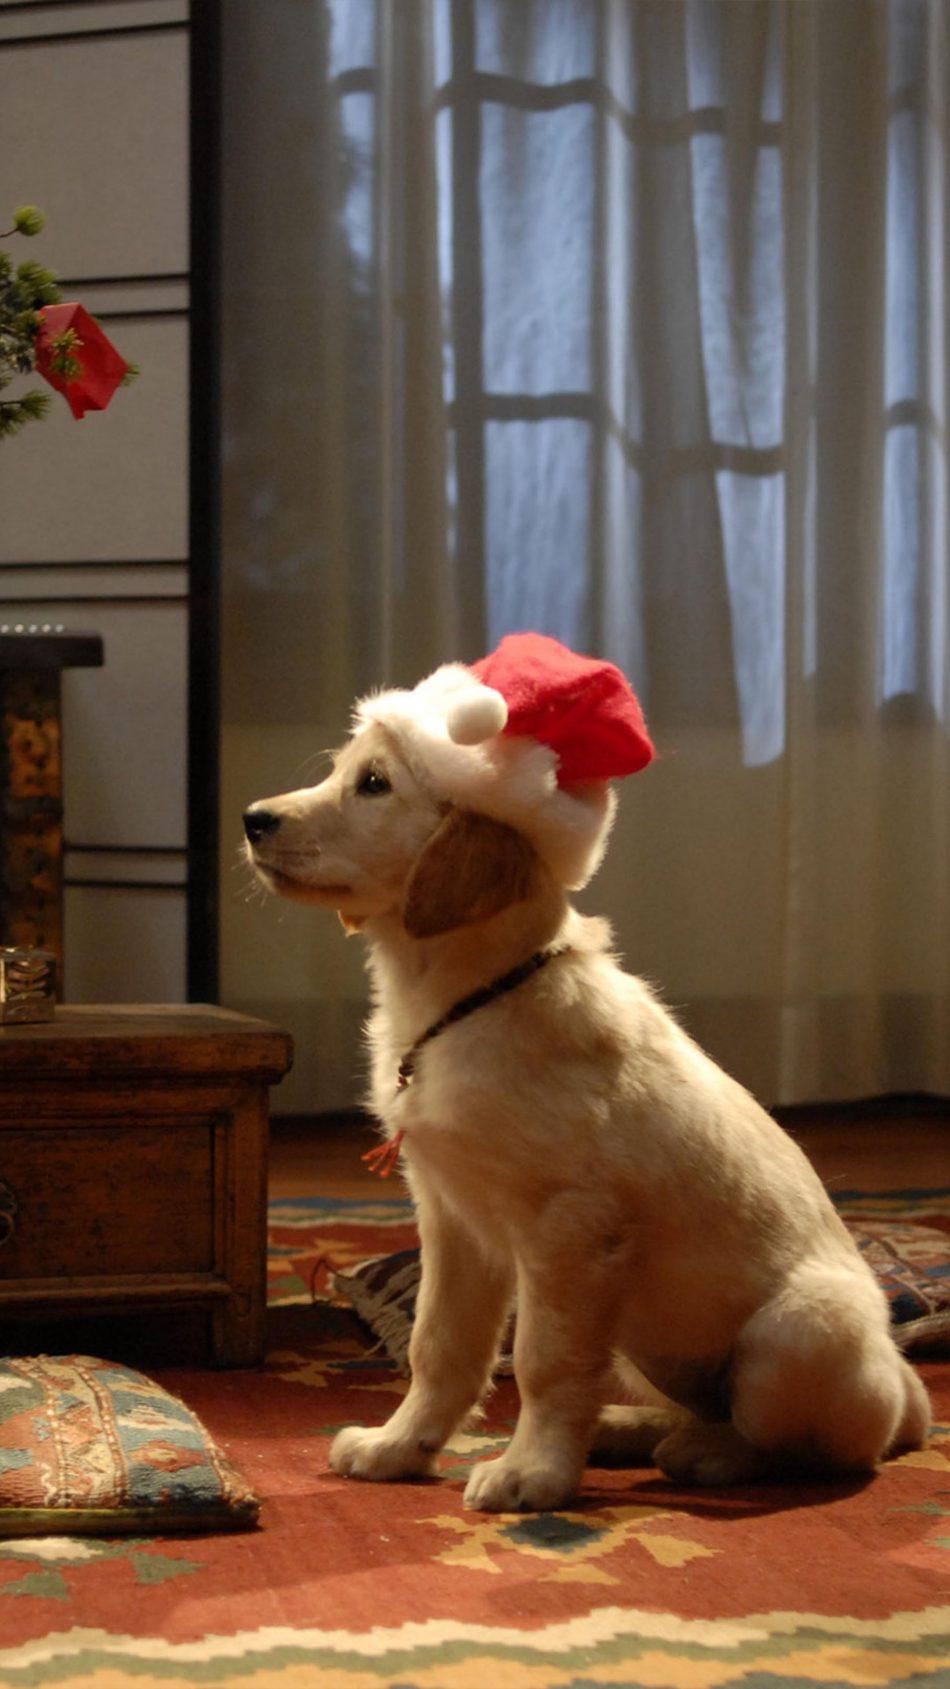 Dog Santa Hat Christmas 4K Ultra HD Mobile Wallpaper